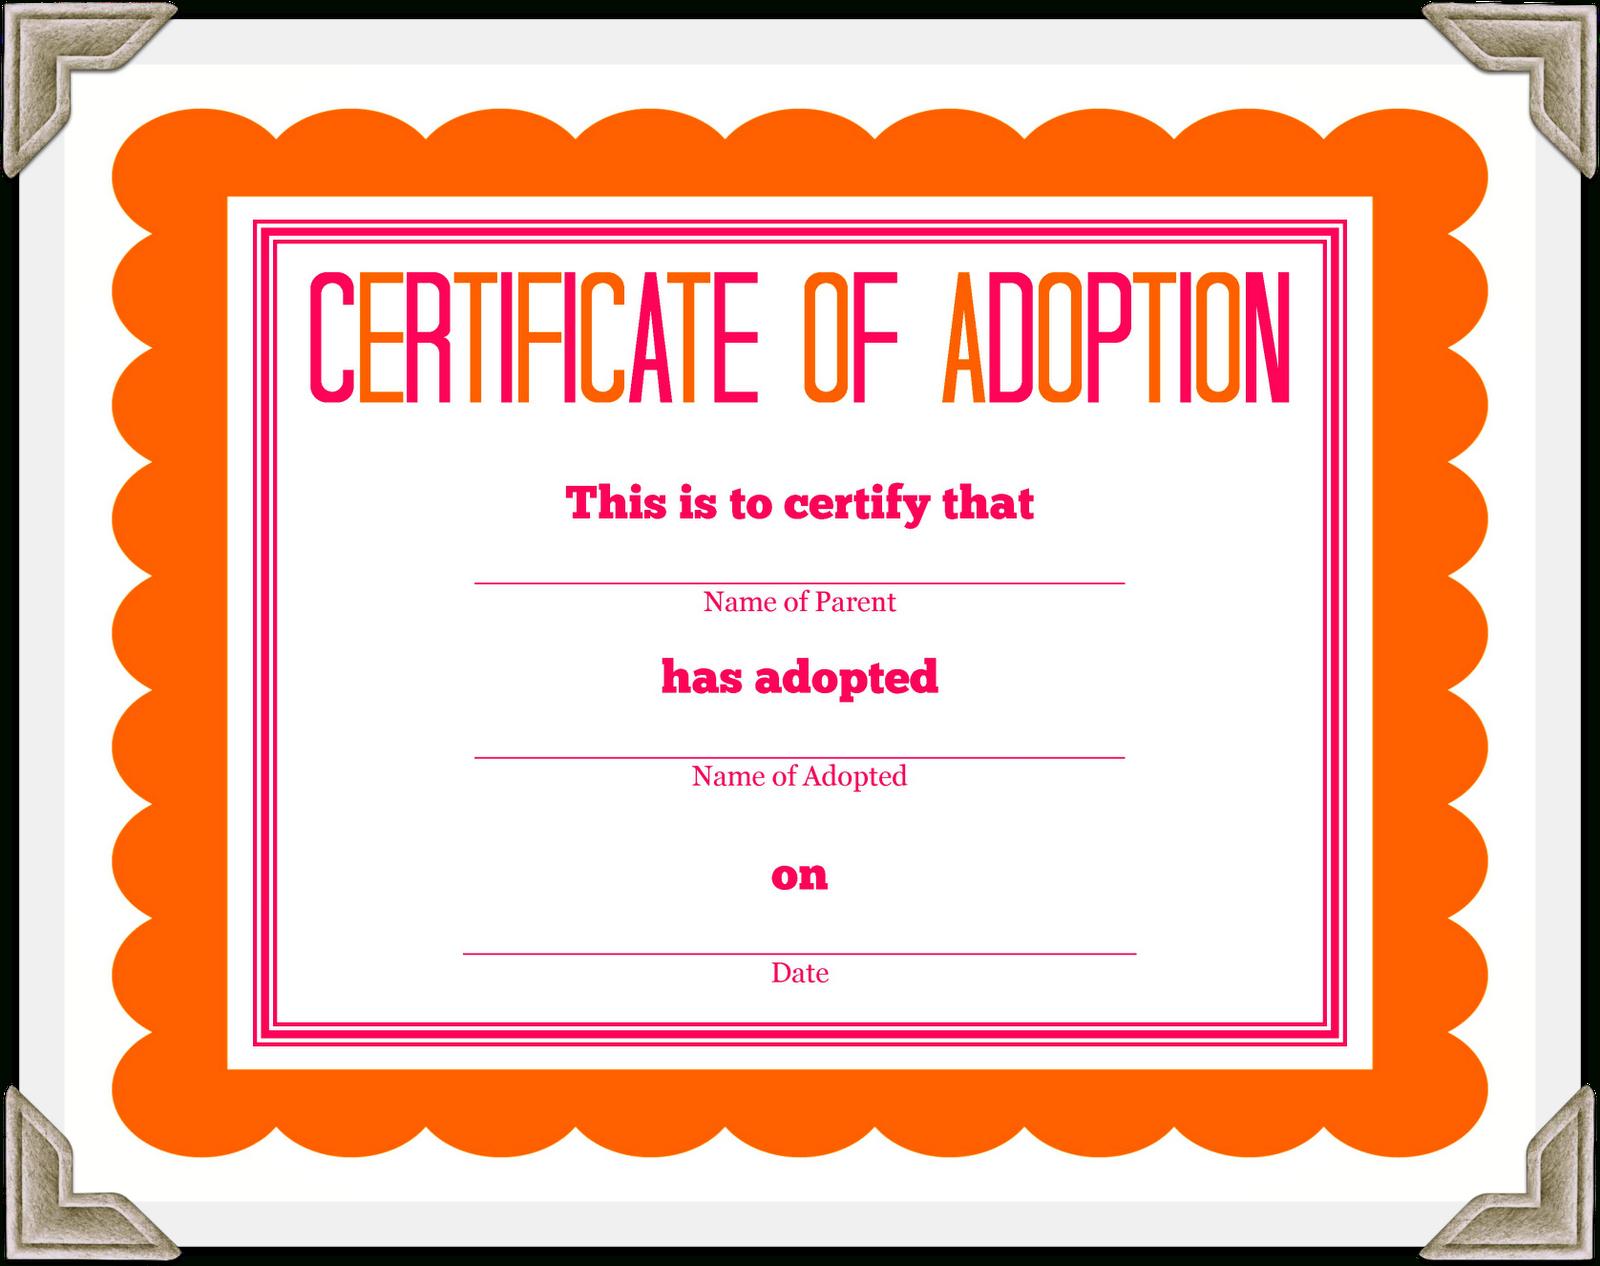 Stuffed Animal Adoption Certificate - Free Printable Adoption Certificate